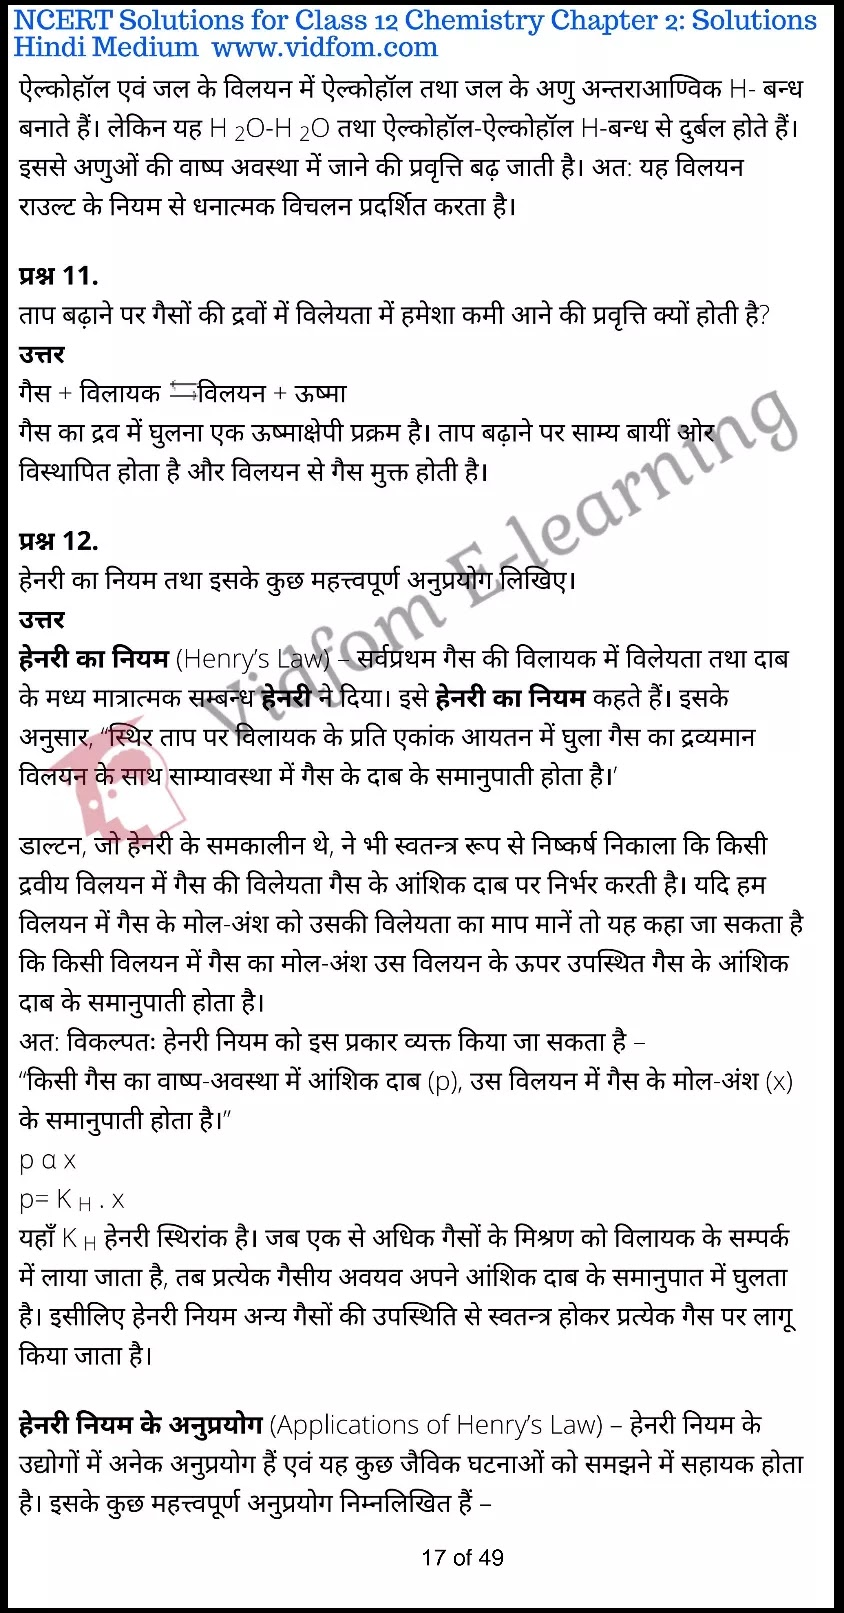 class 12 chemistry chapter 2 light hindi medium 17